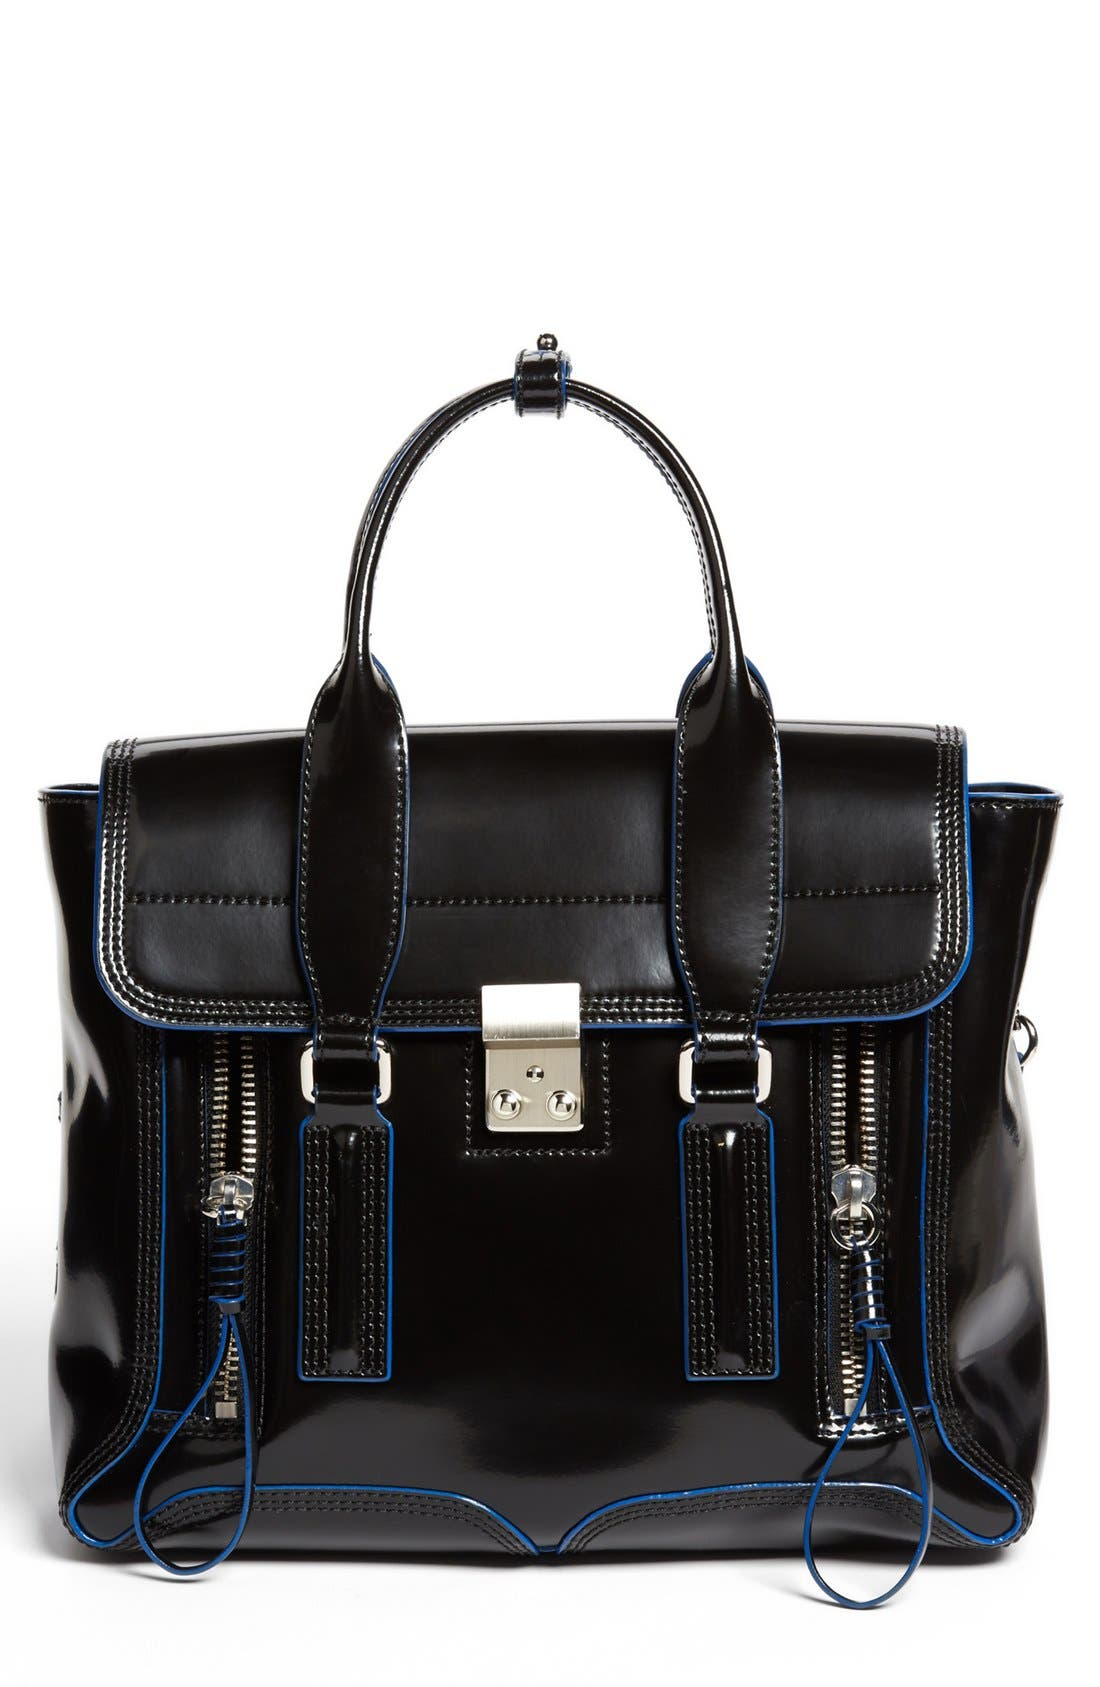 Alternate Image 1 Selected - 3.1 Phillip Lim 'Medium Pashli' Spazzolato Leather Satchel